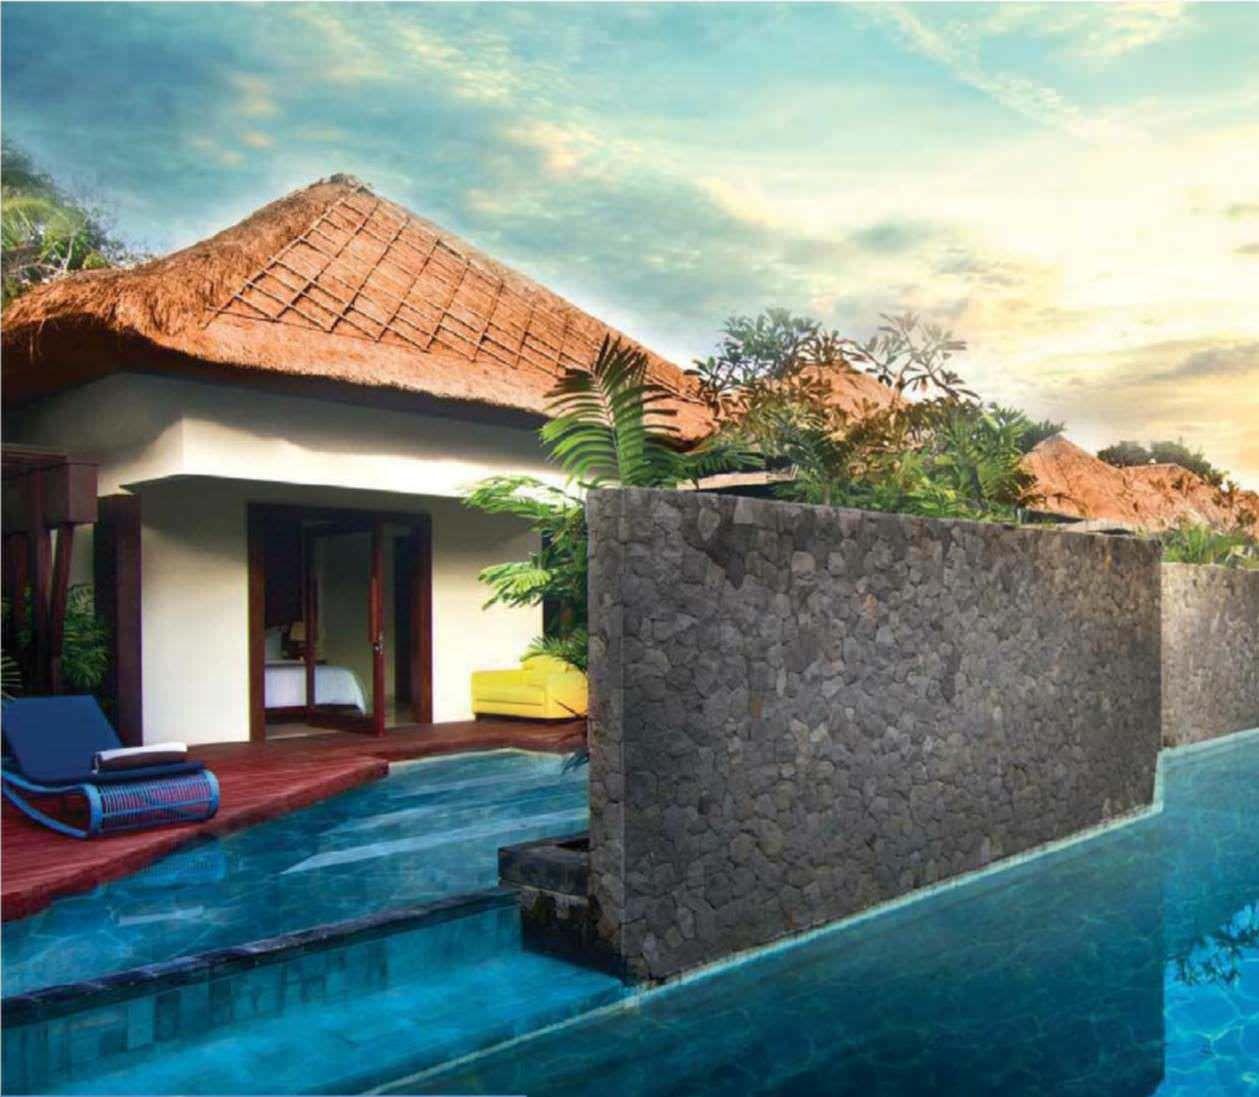 inaya putri bali indonesia. Black Bedroom Furniture Sets. Home Design Ideas